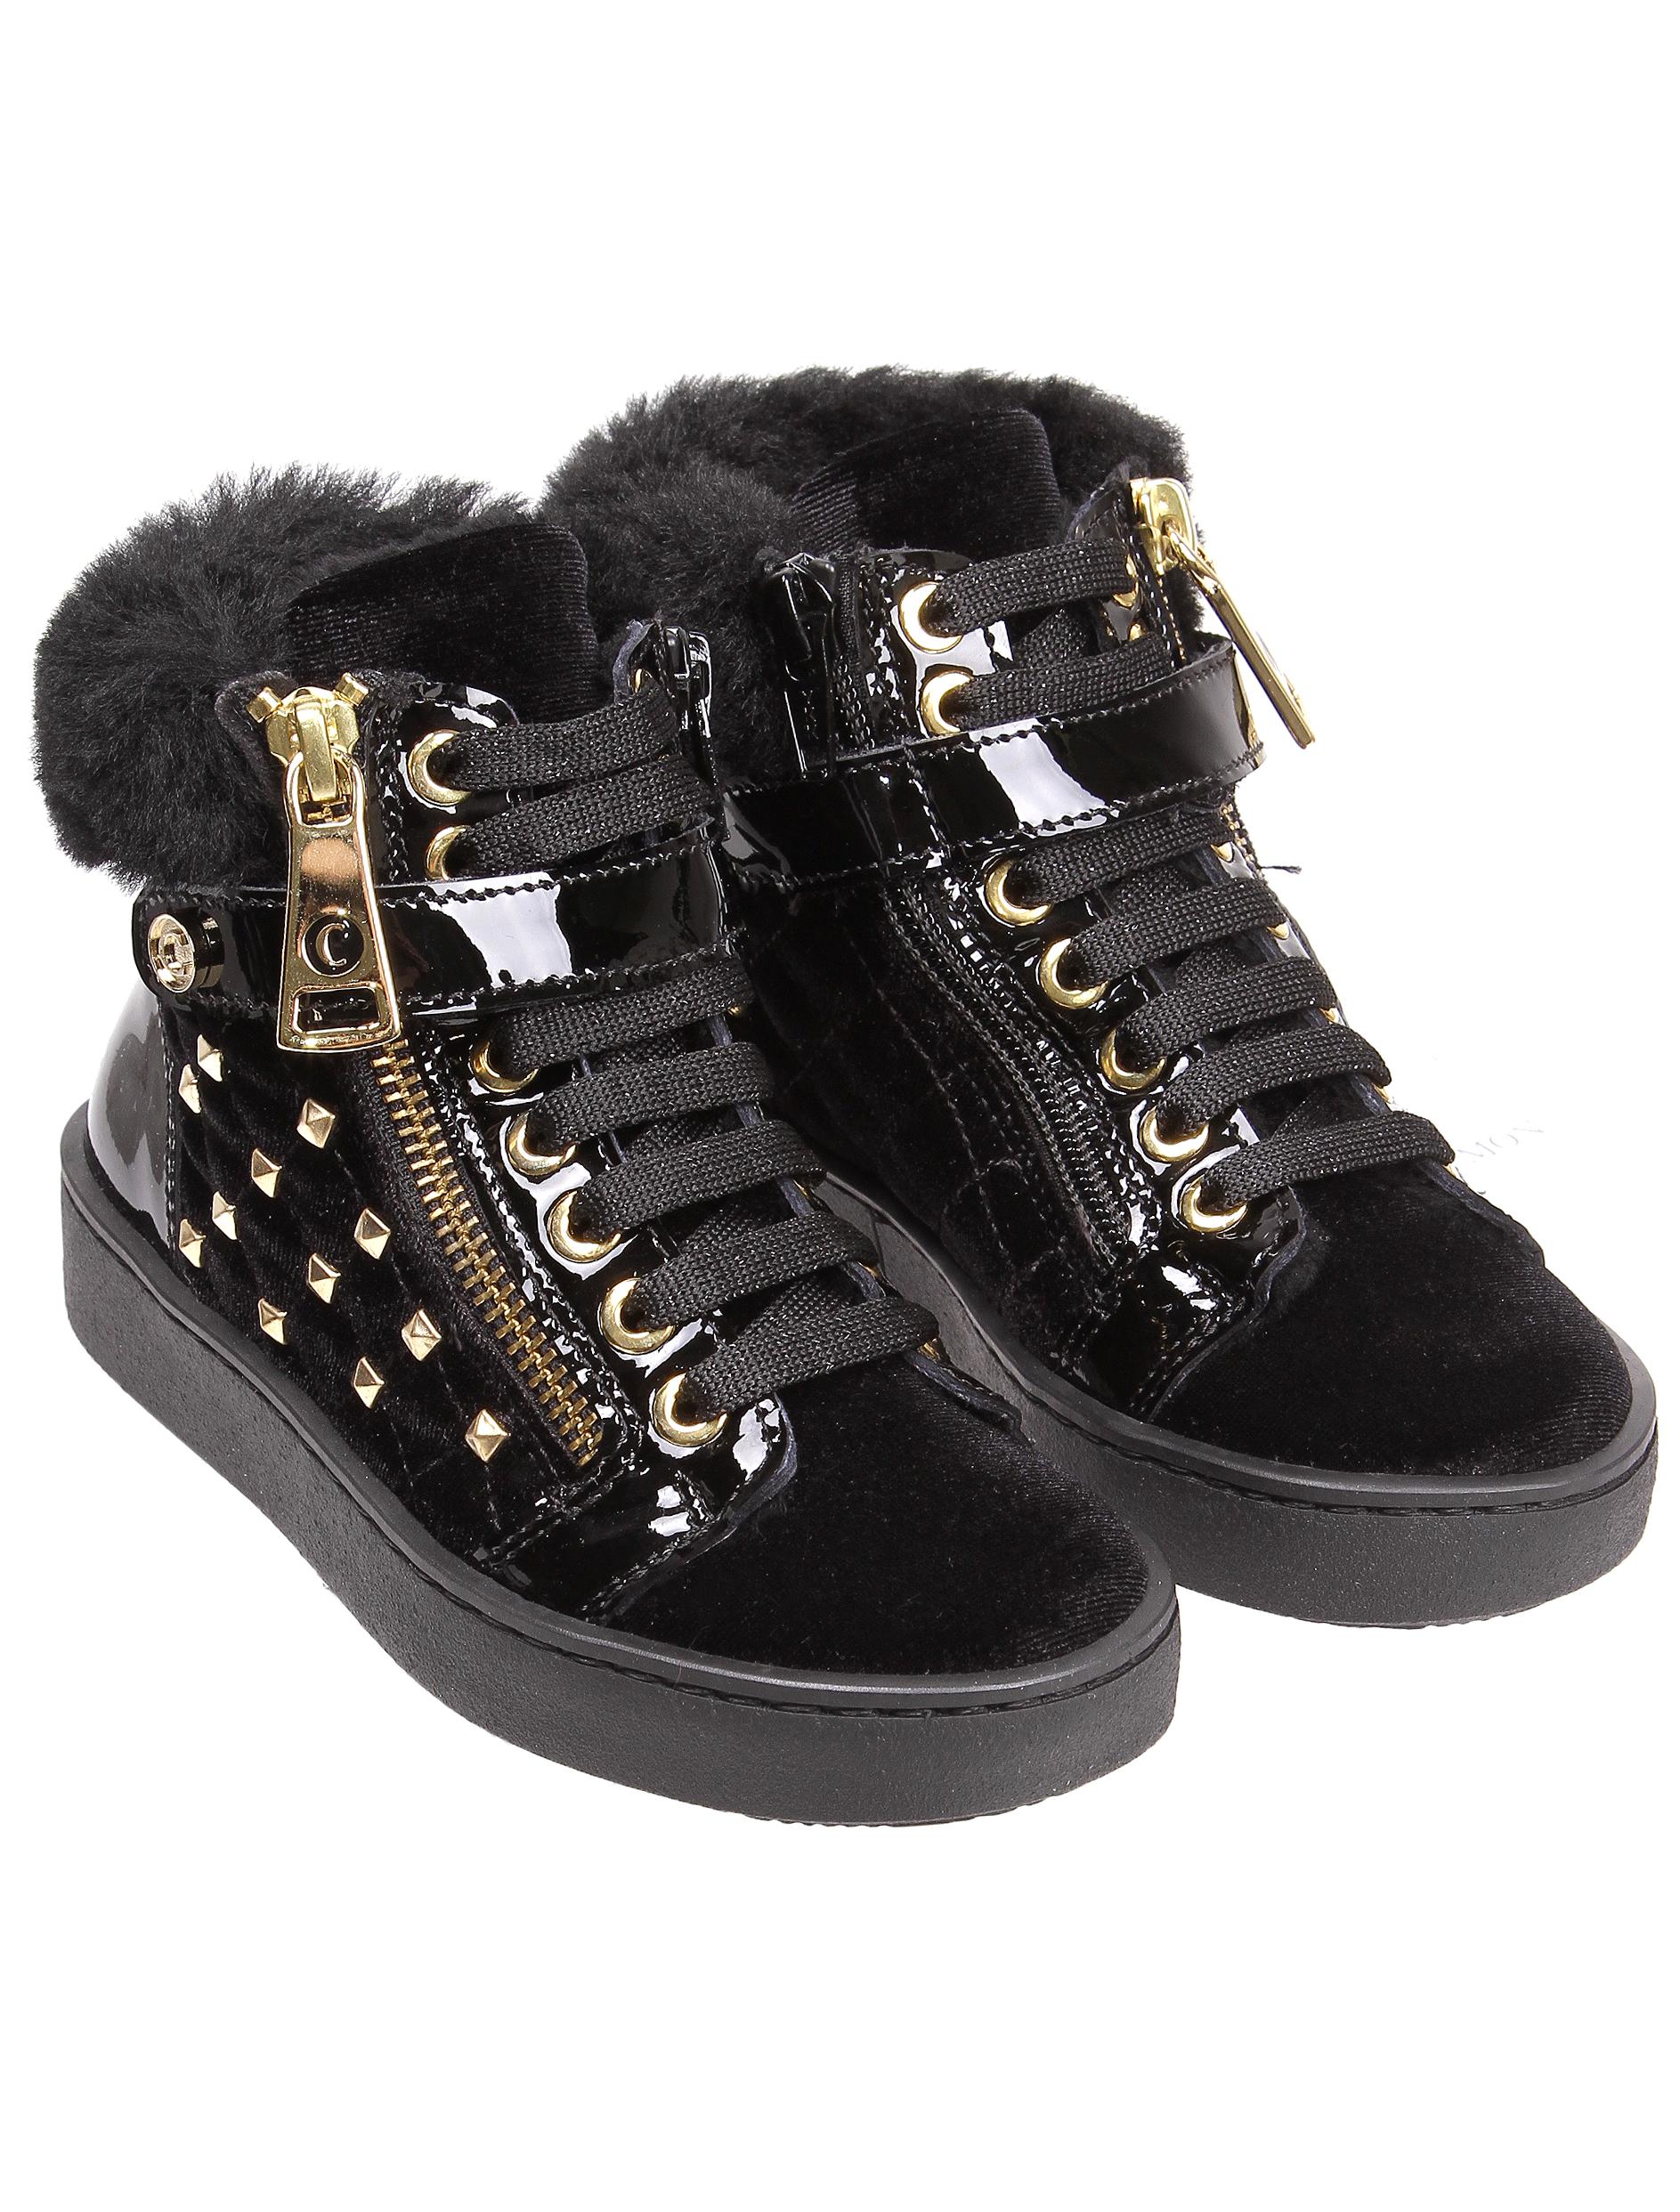 Ботинки Cherie черного цвета